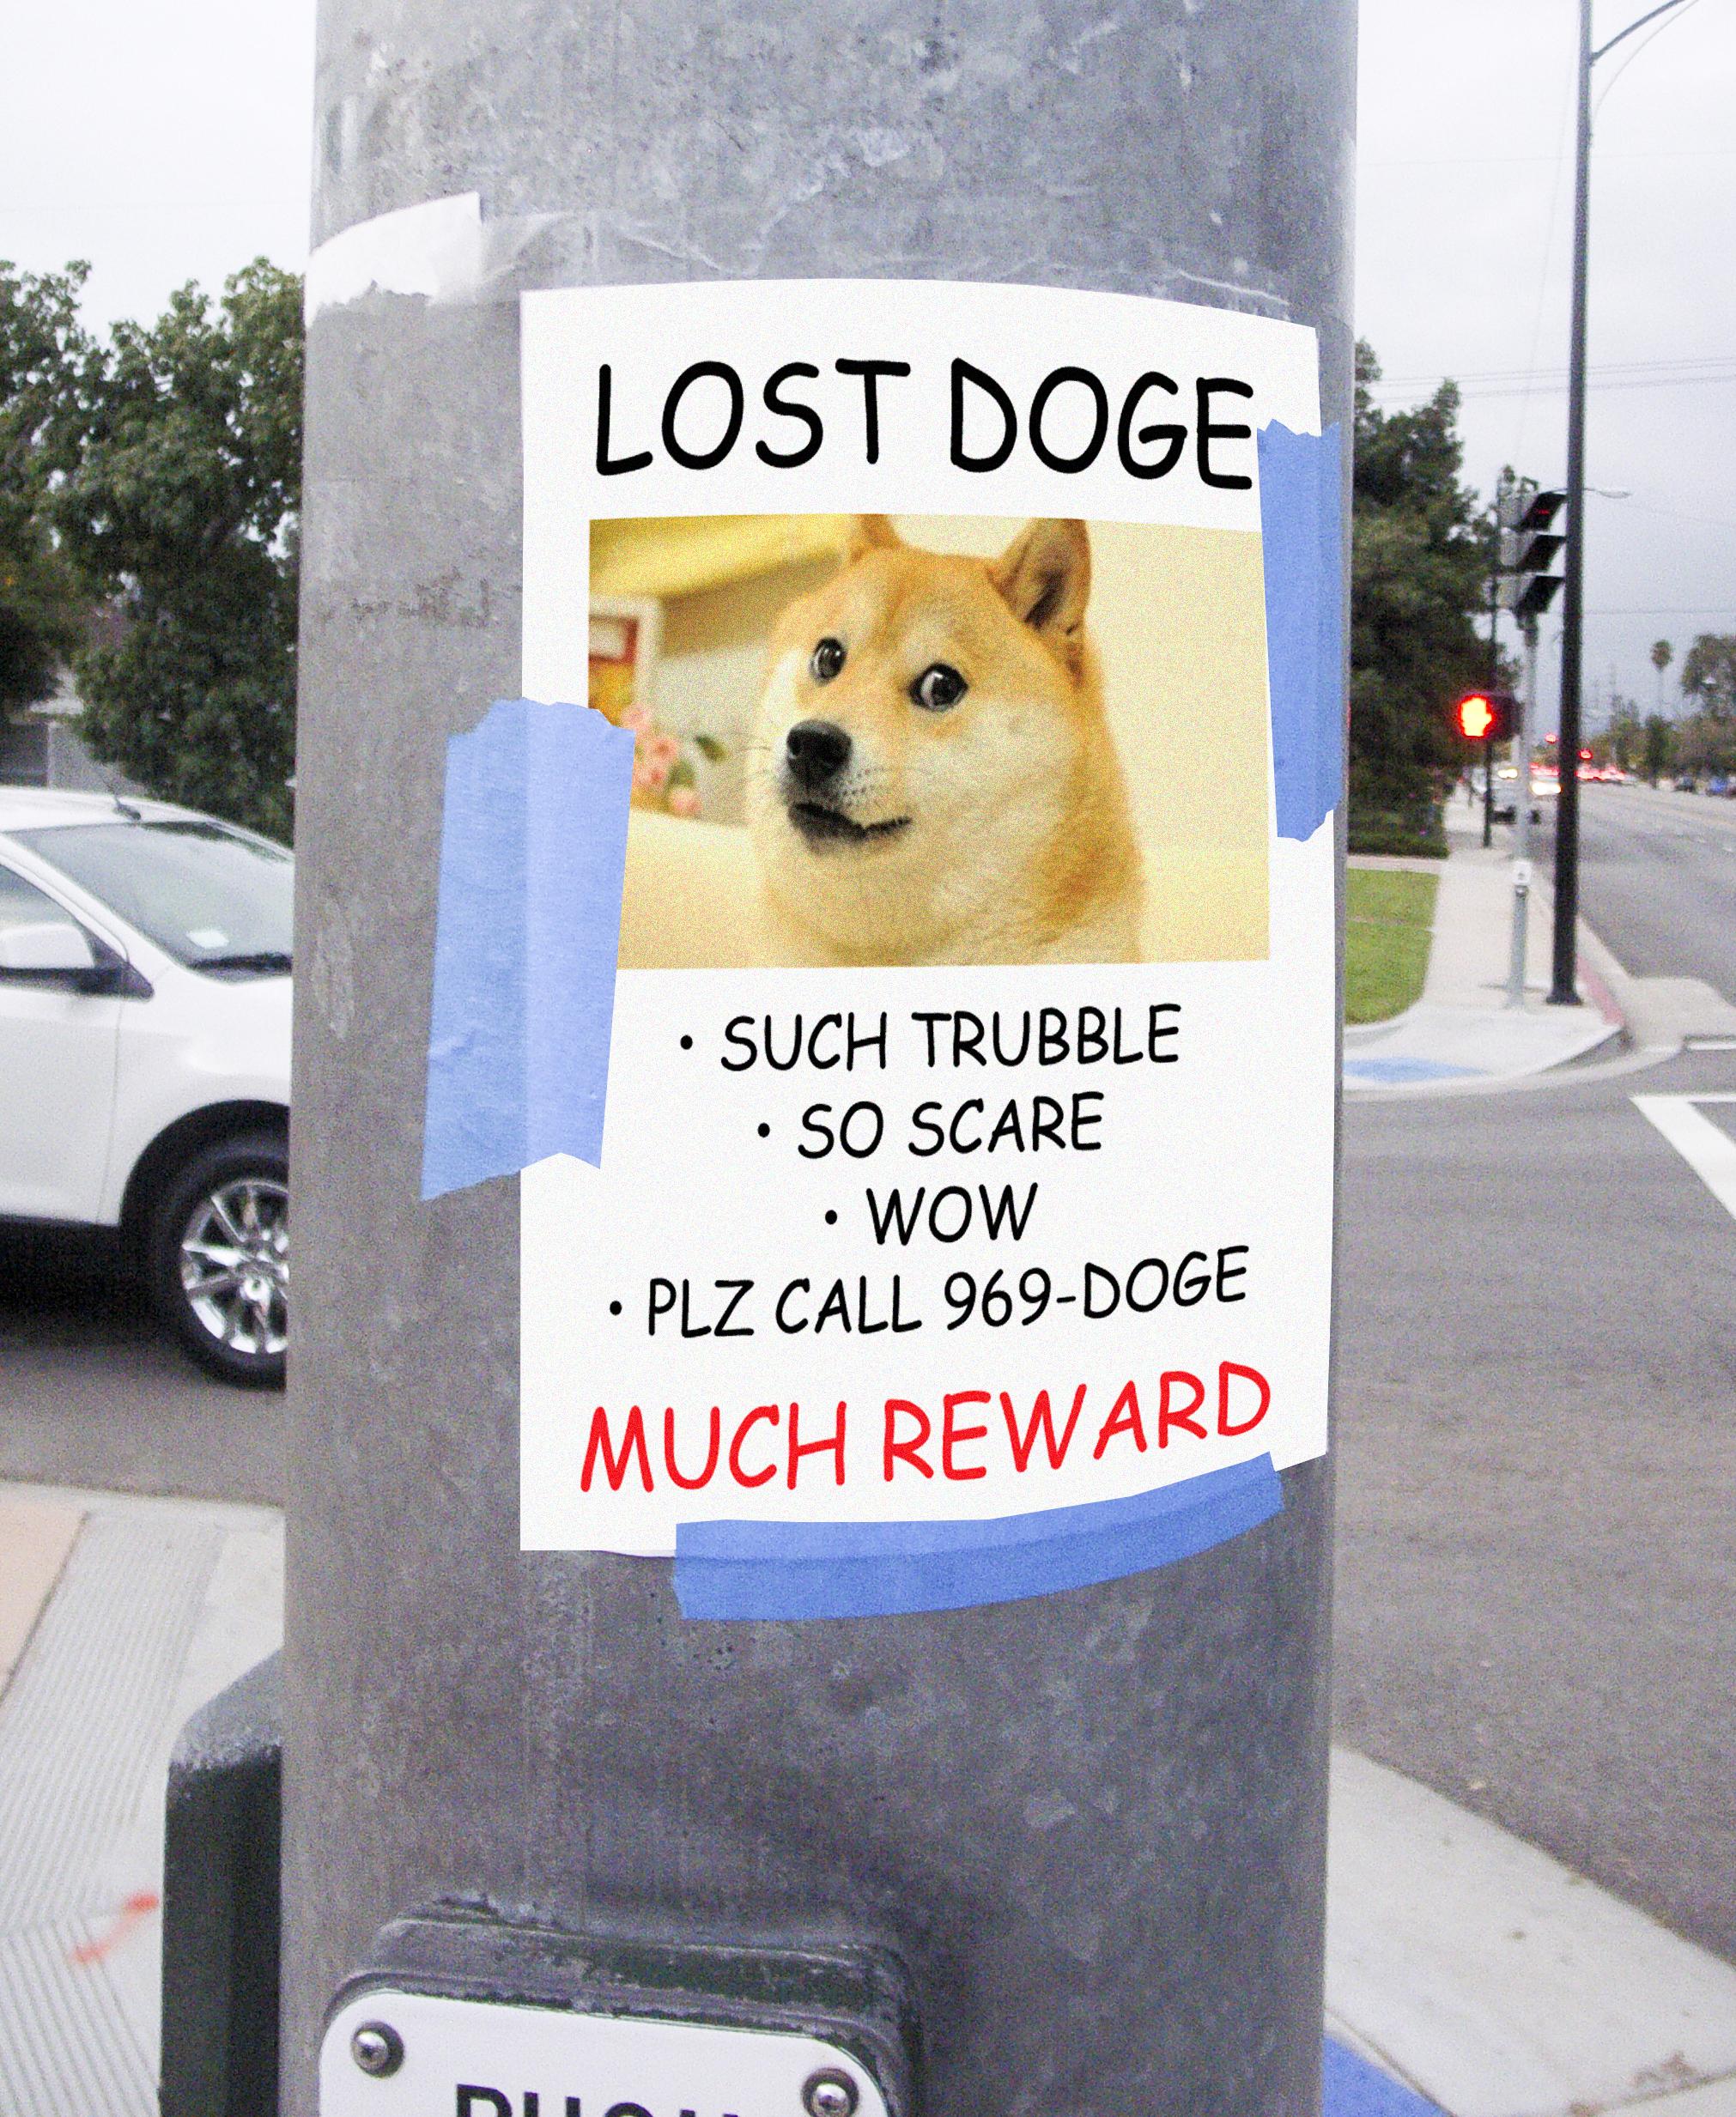 LOST DOGE SUCH TRUBBLE SO SCARE WOW PLZ CALL 969 MUCH REWARD